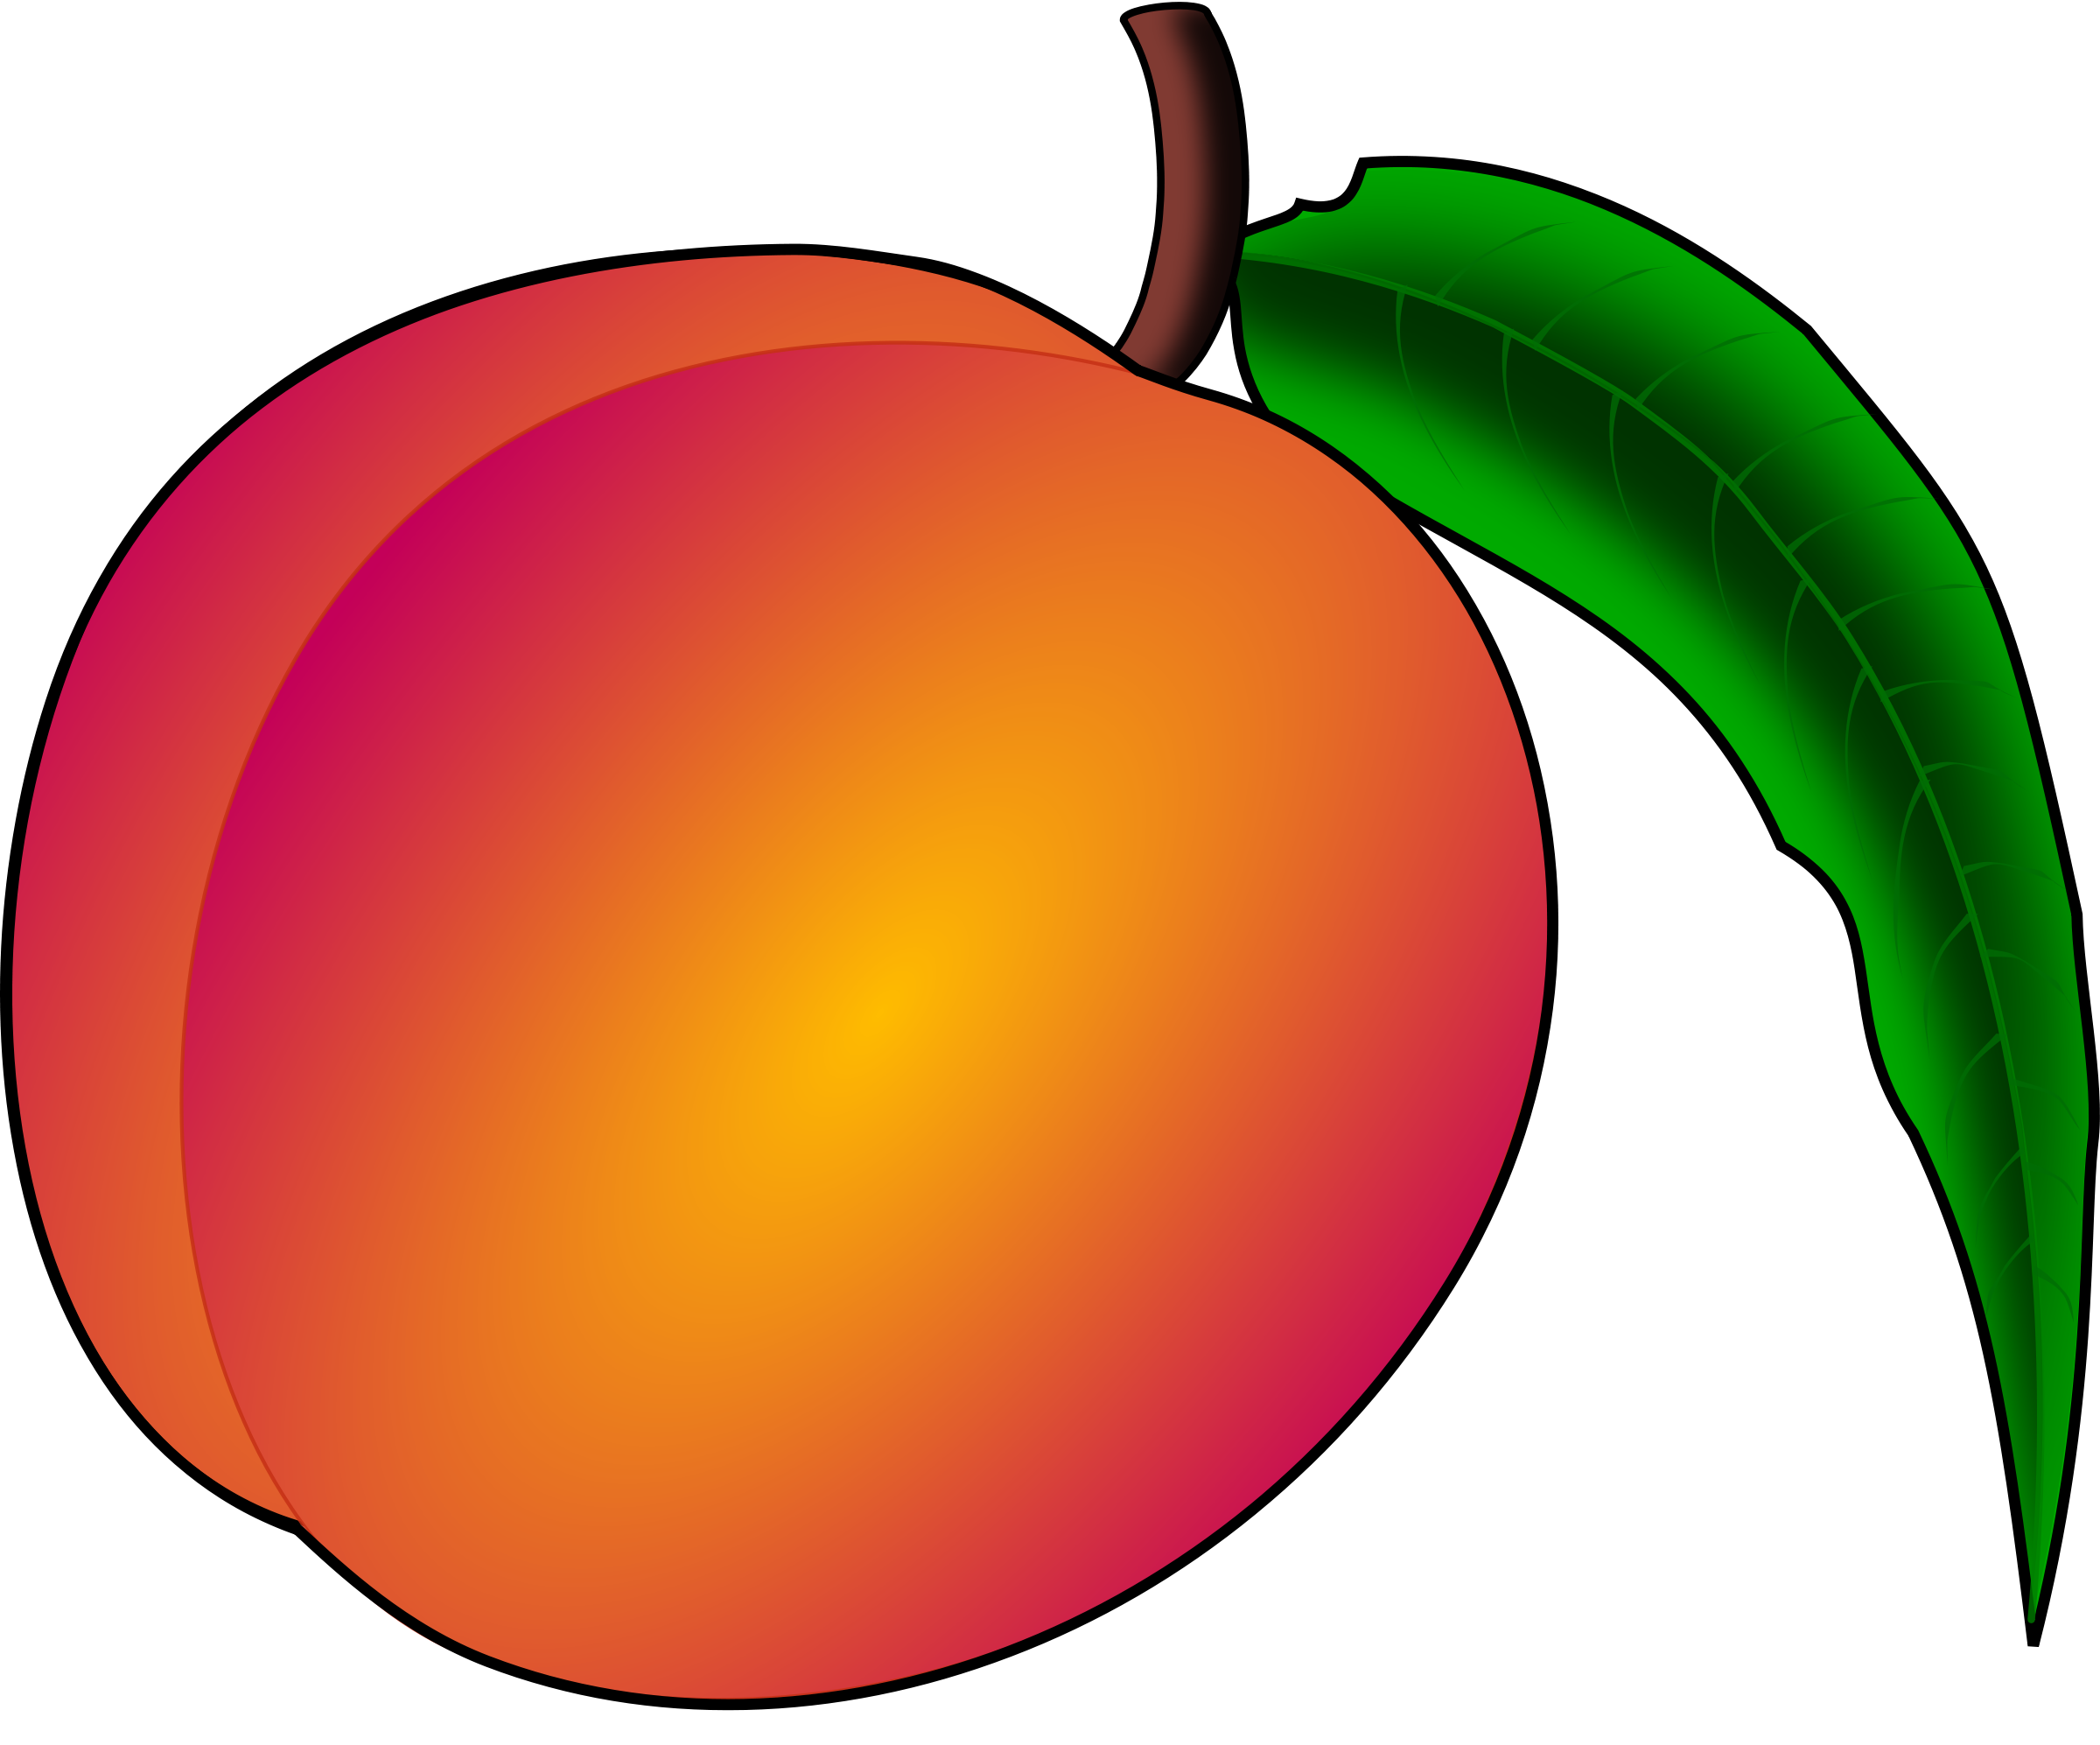 Peach clip art free. Watermelon clipart animated